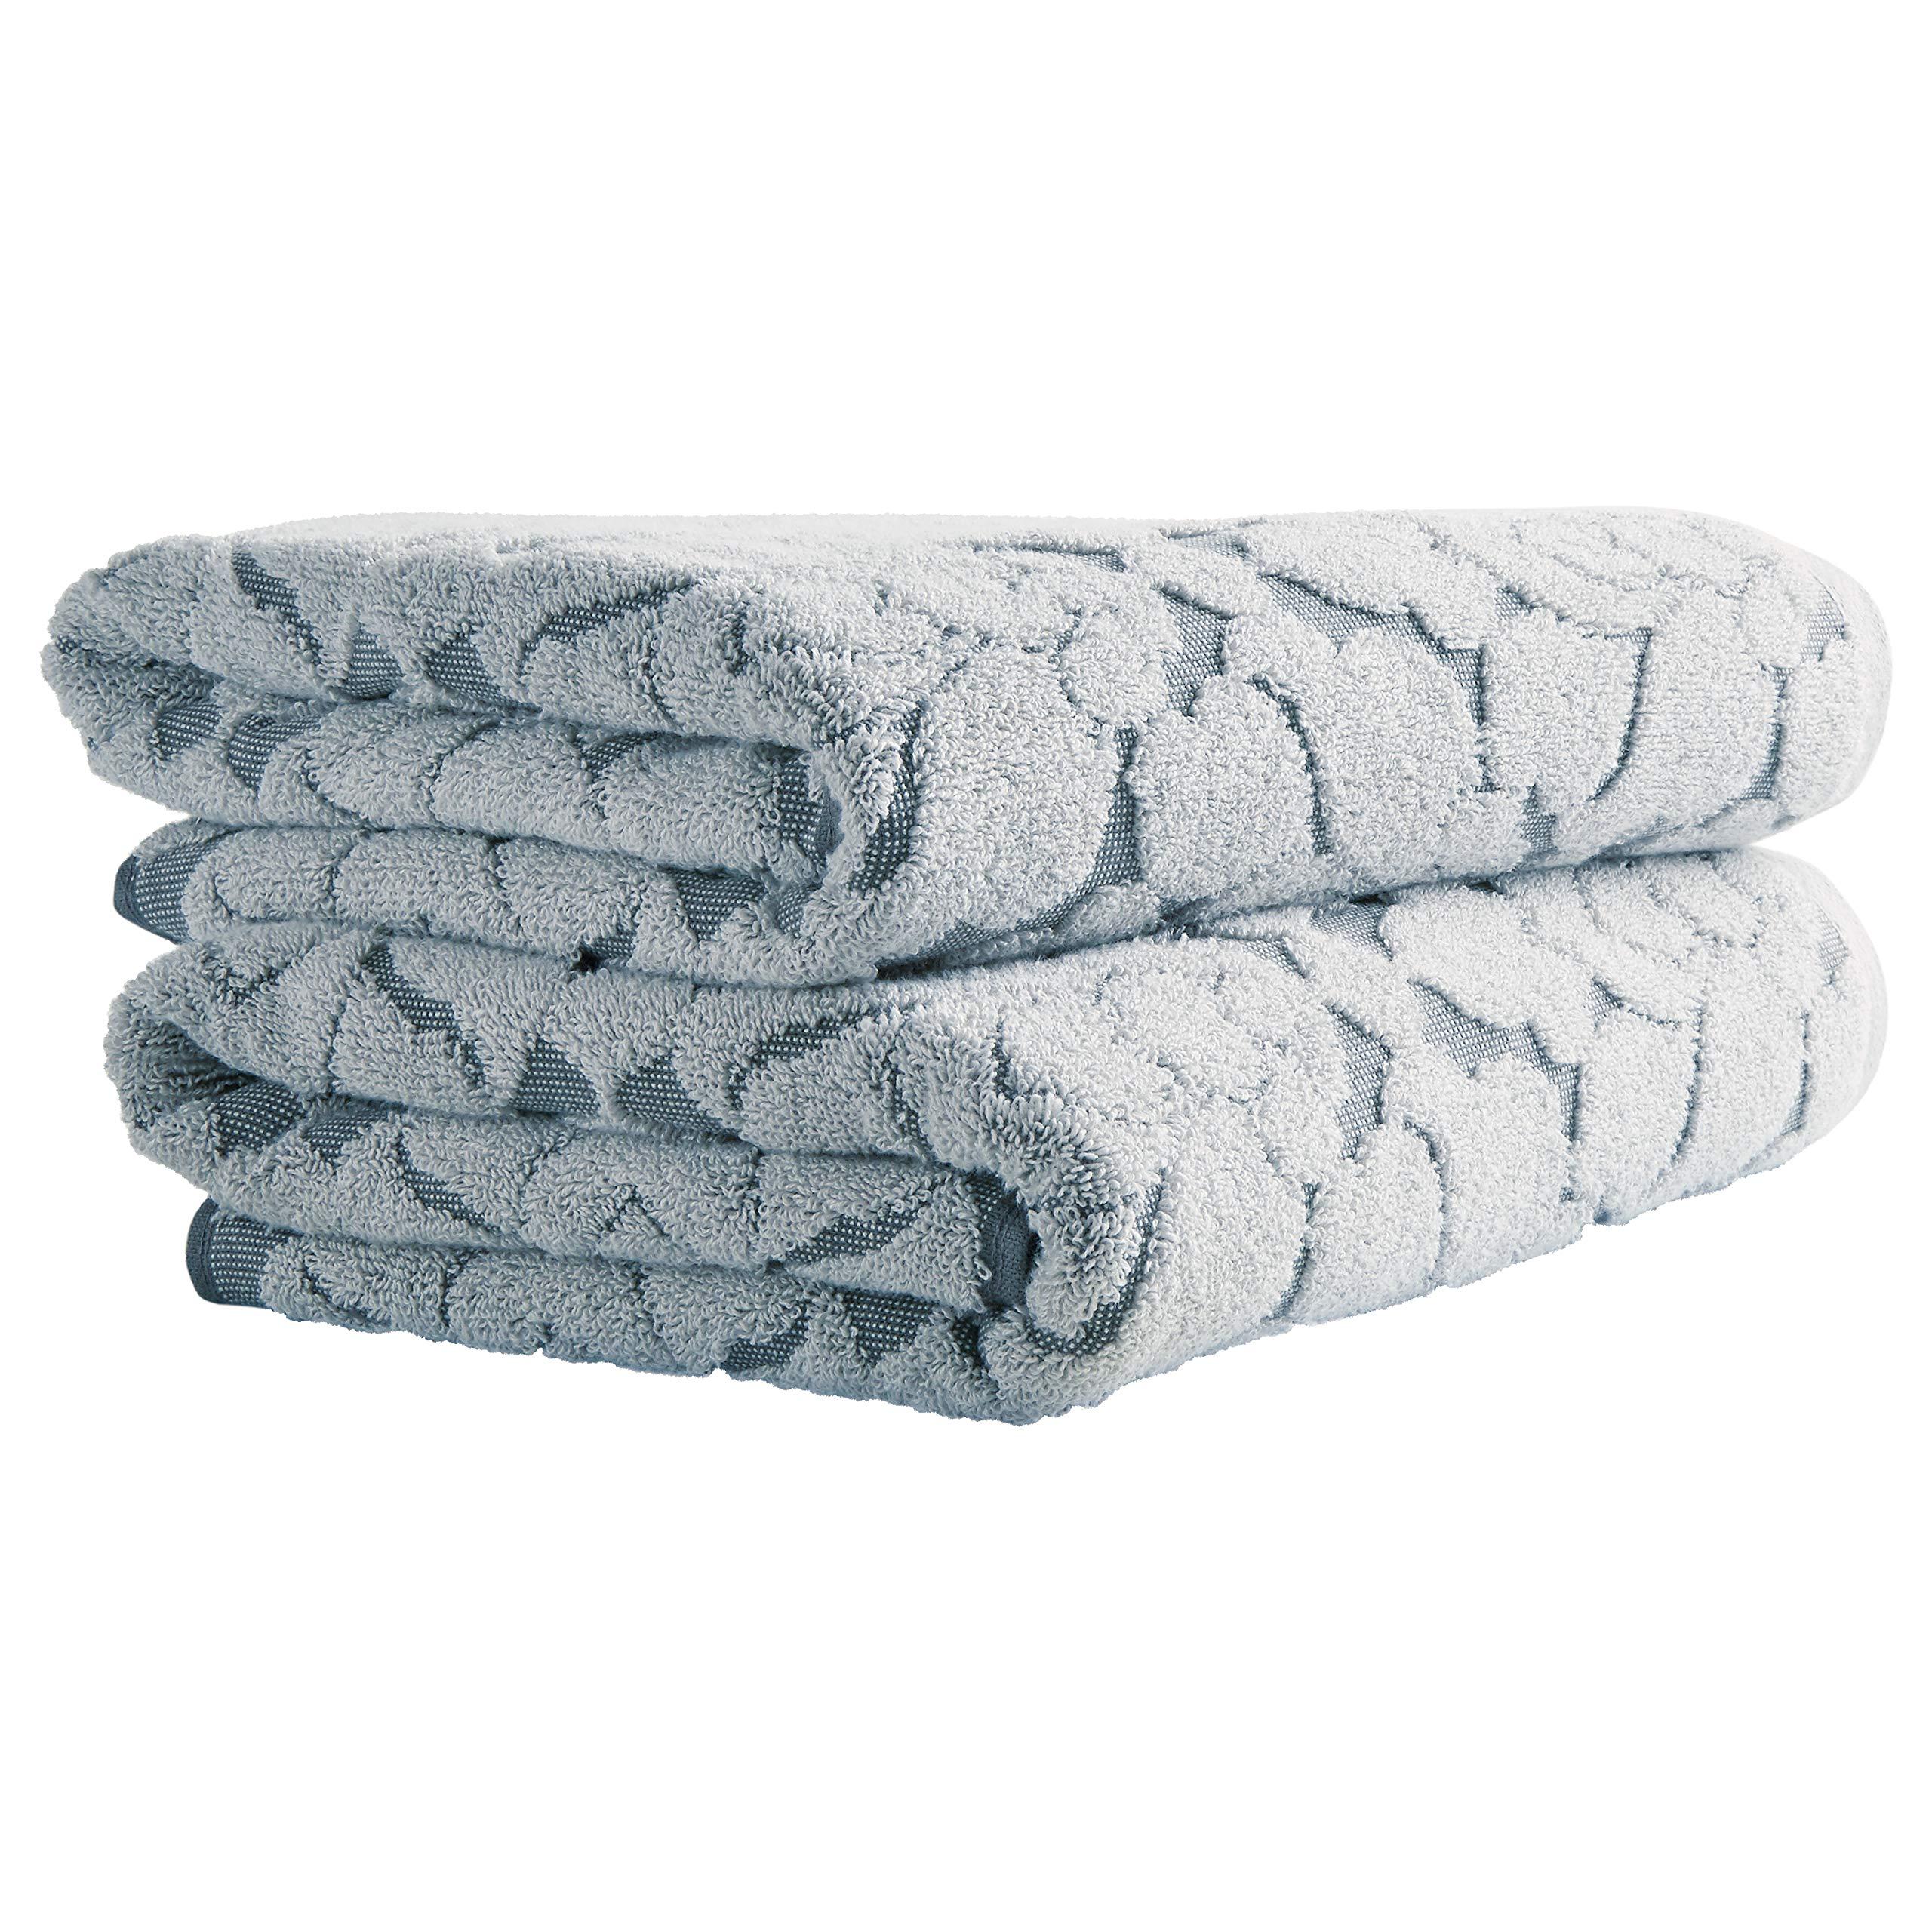 Stone & Beam Flora Jacquard Cotton Bath Towels, 2-Pack, Regatta